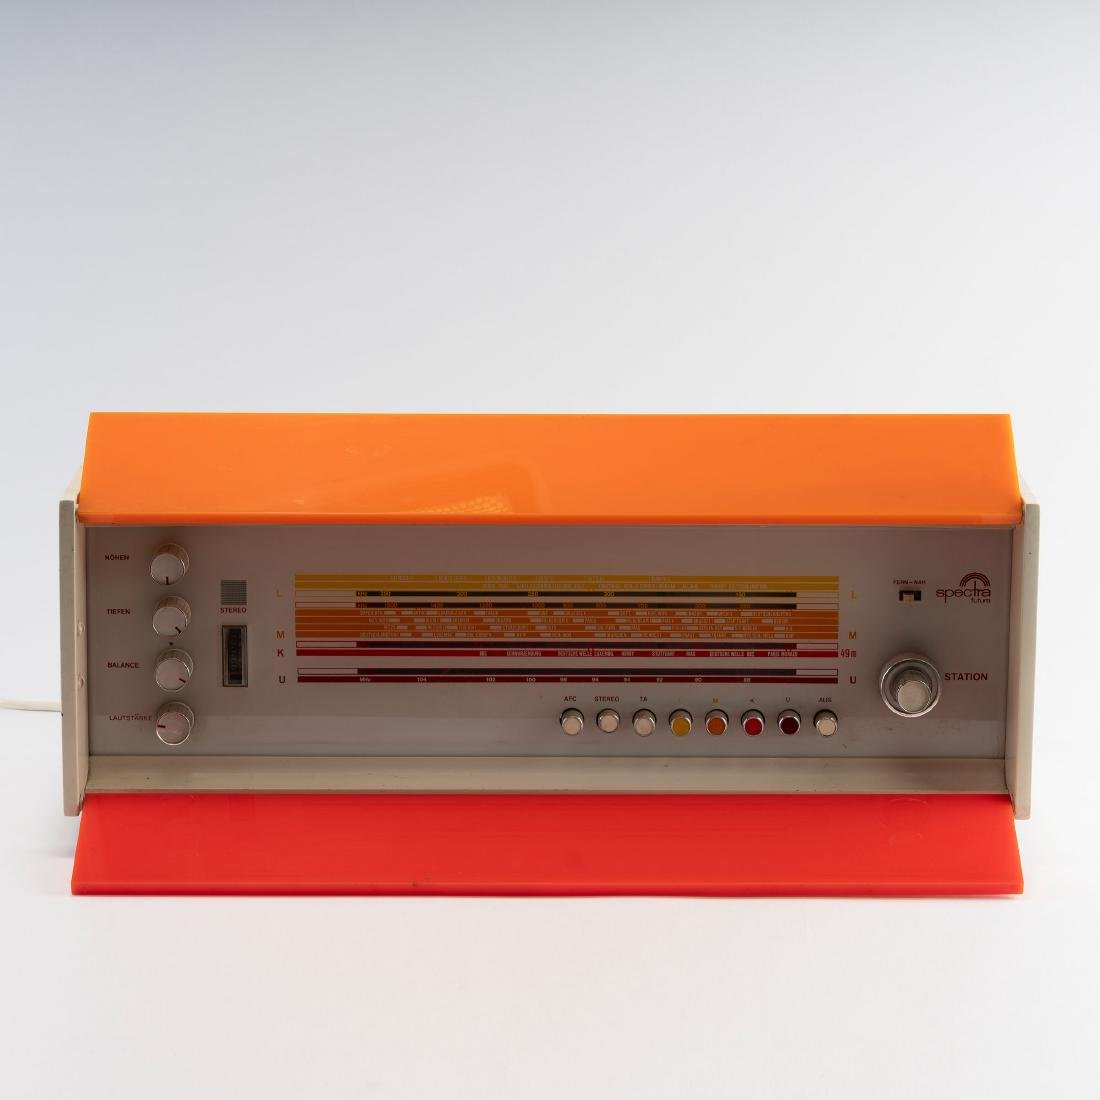 'Spectra Futura' - 'ST 969' radio, 1968/69 - 2